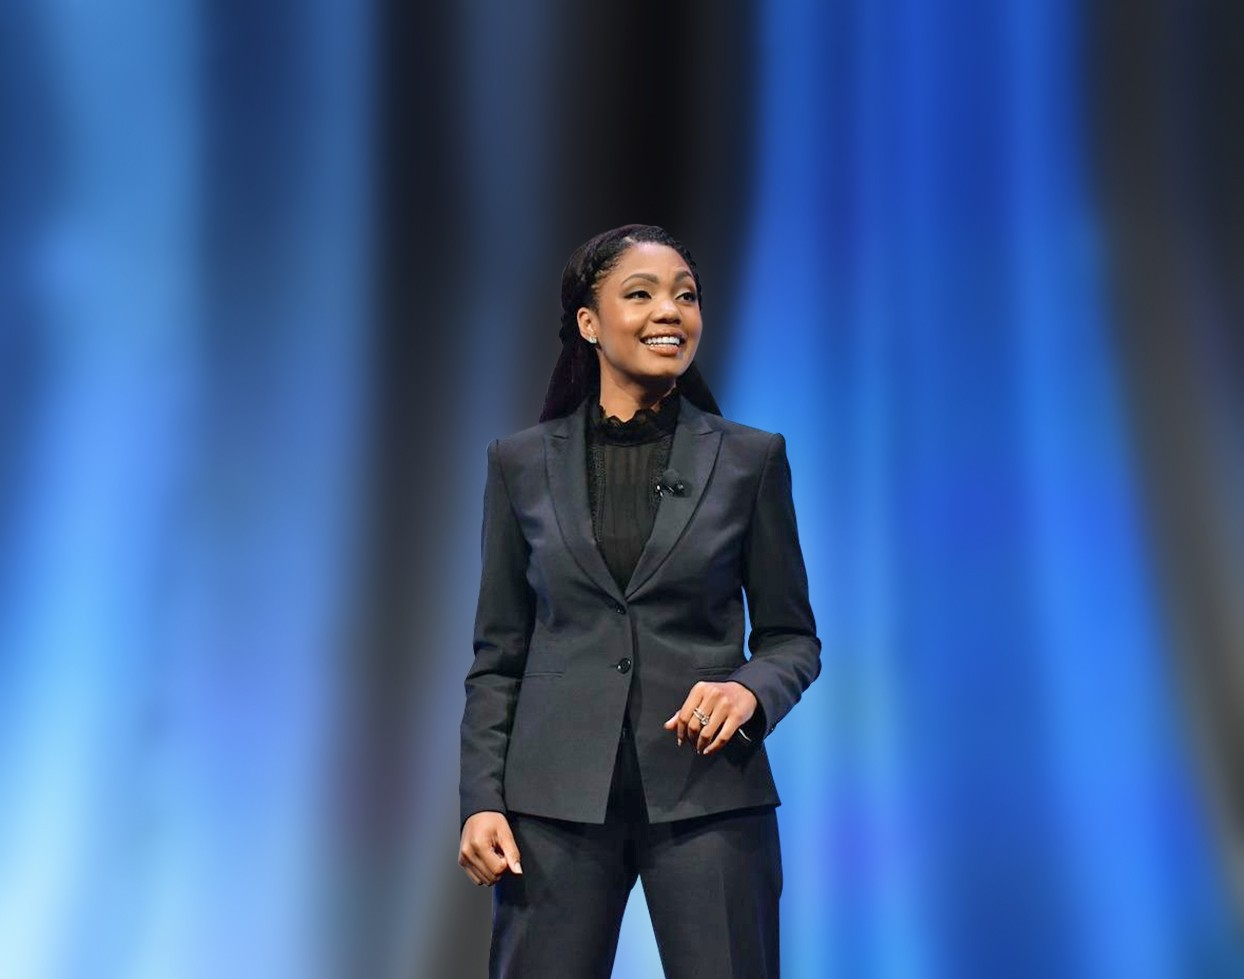 Ramona J. Smith, 2018 Toastmasters World Champion of Public Speaking (PRNewsfoto/Toastmasters International)